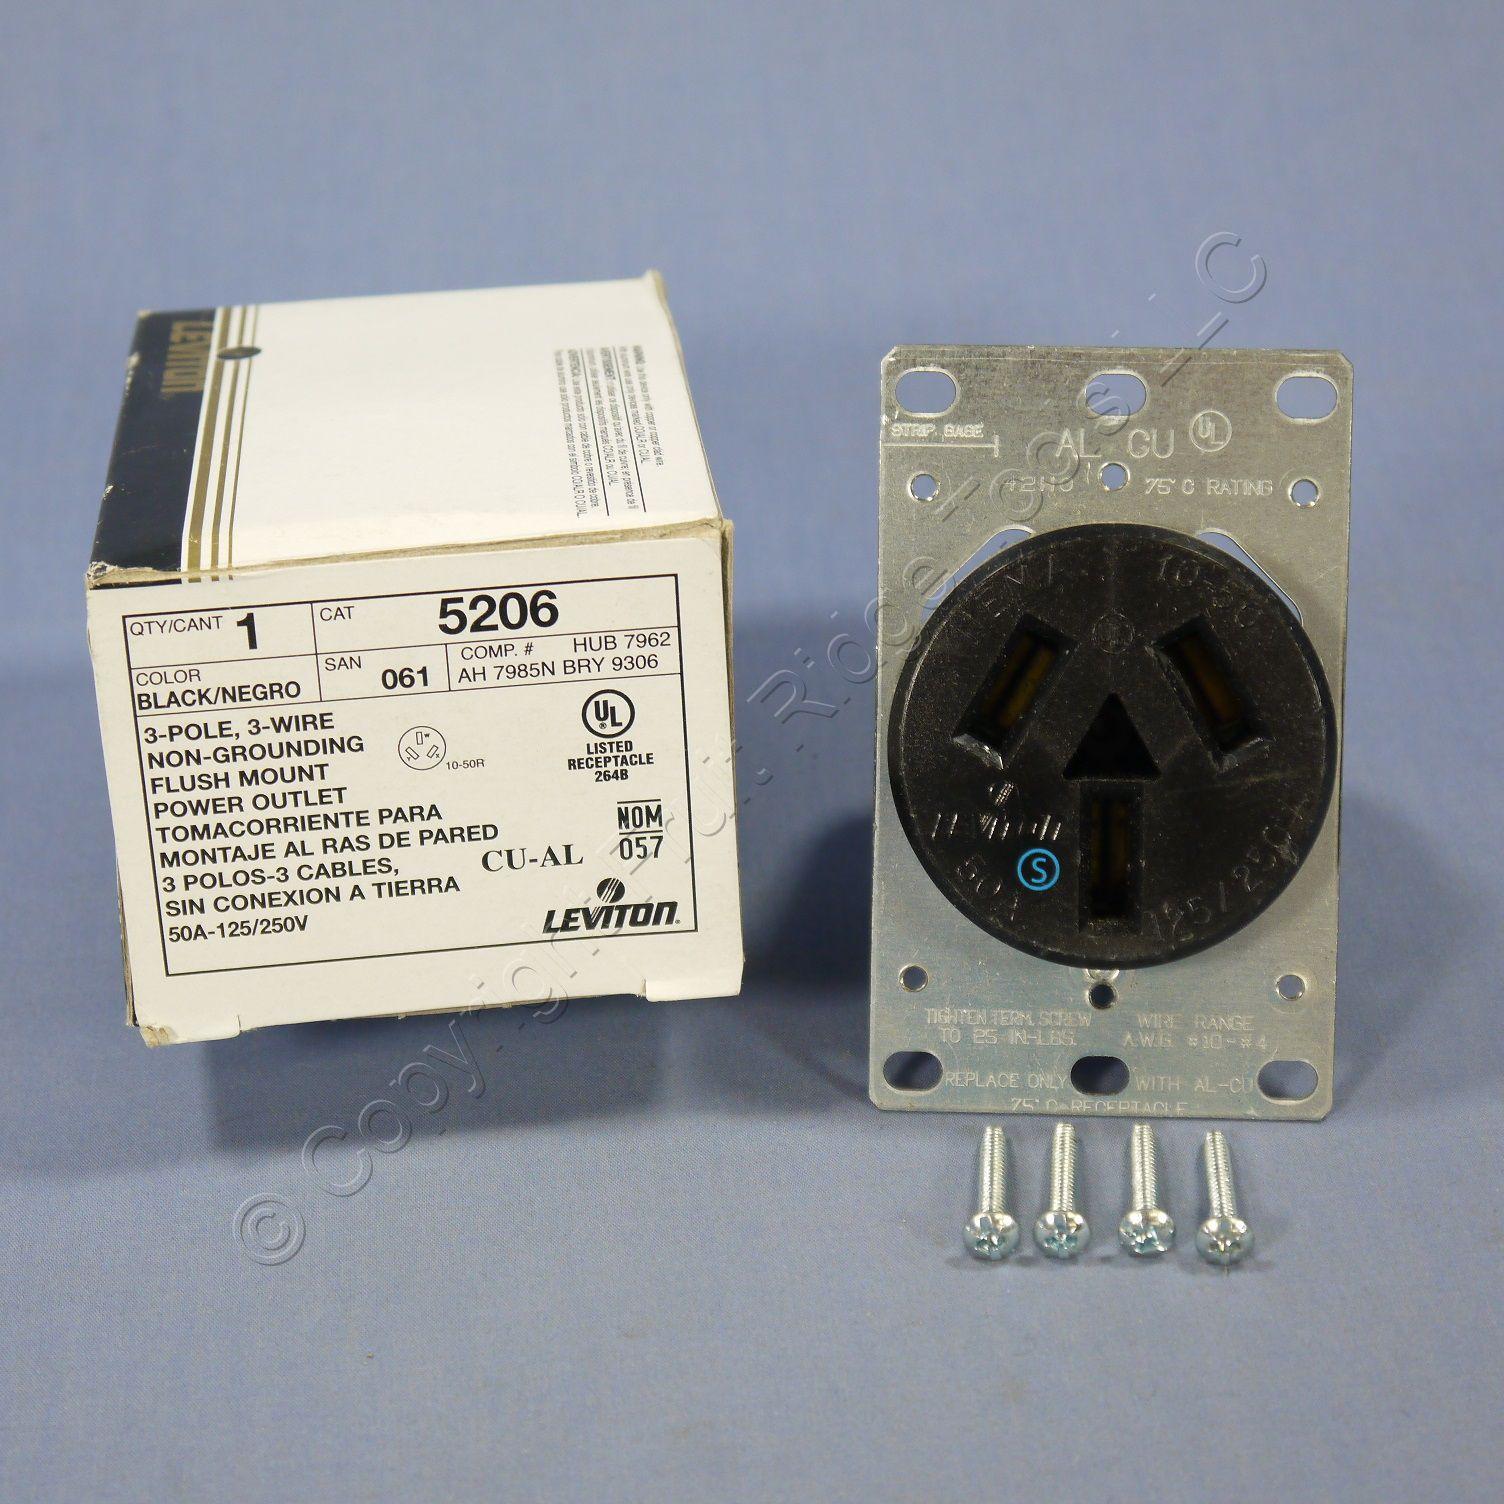 Buy Leviton Range Outlet Receptacle 10-50 50A 125/250V NEMA 10-50R ...